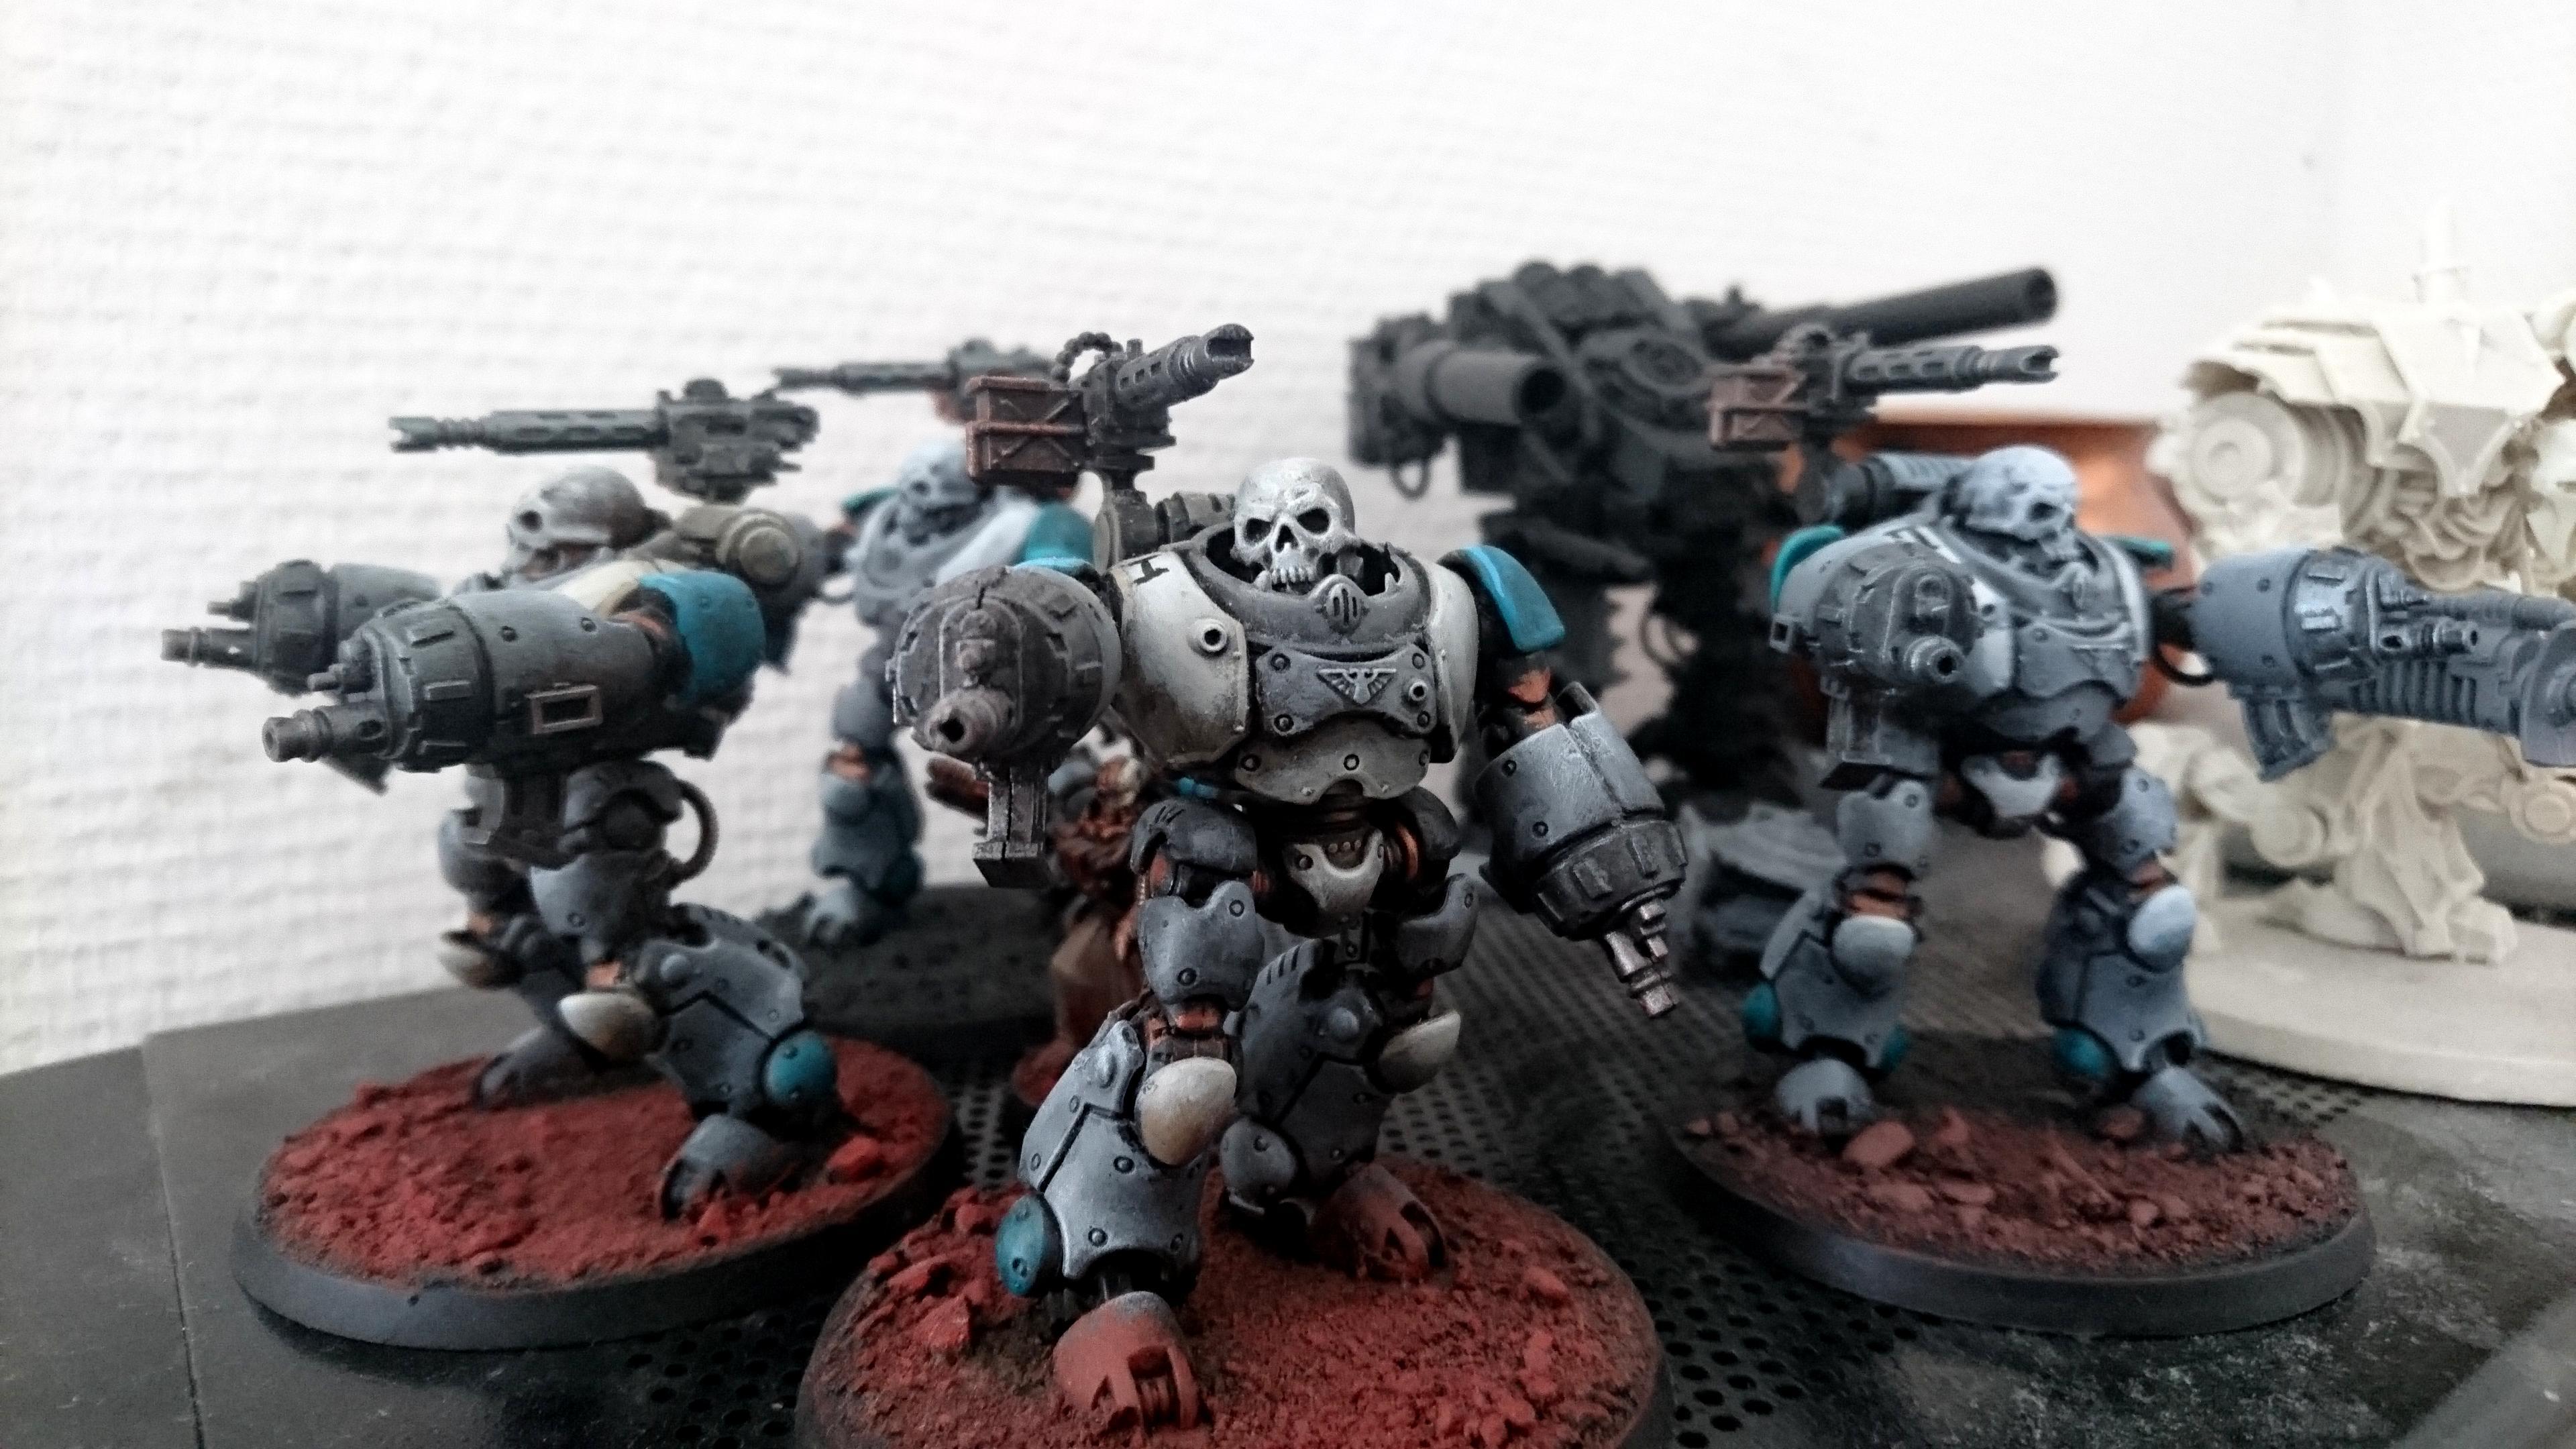 Conversion, Cult Mechanicus, Dark Mechanicum, Skull